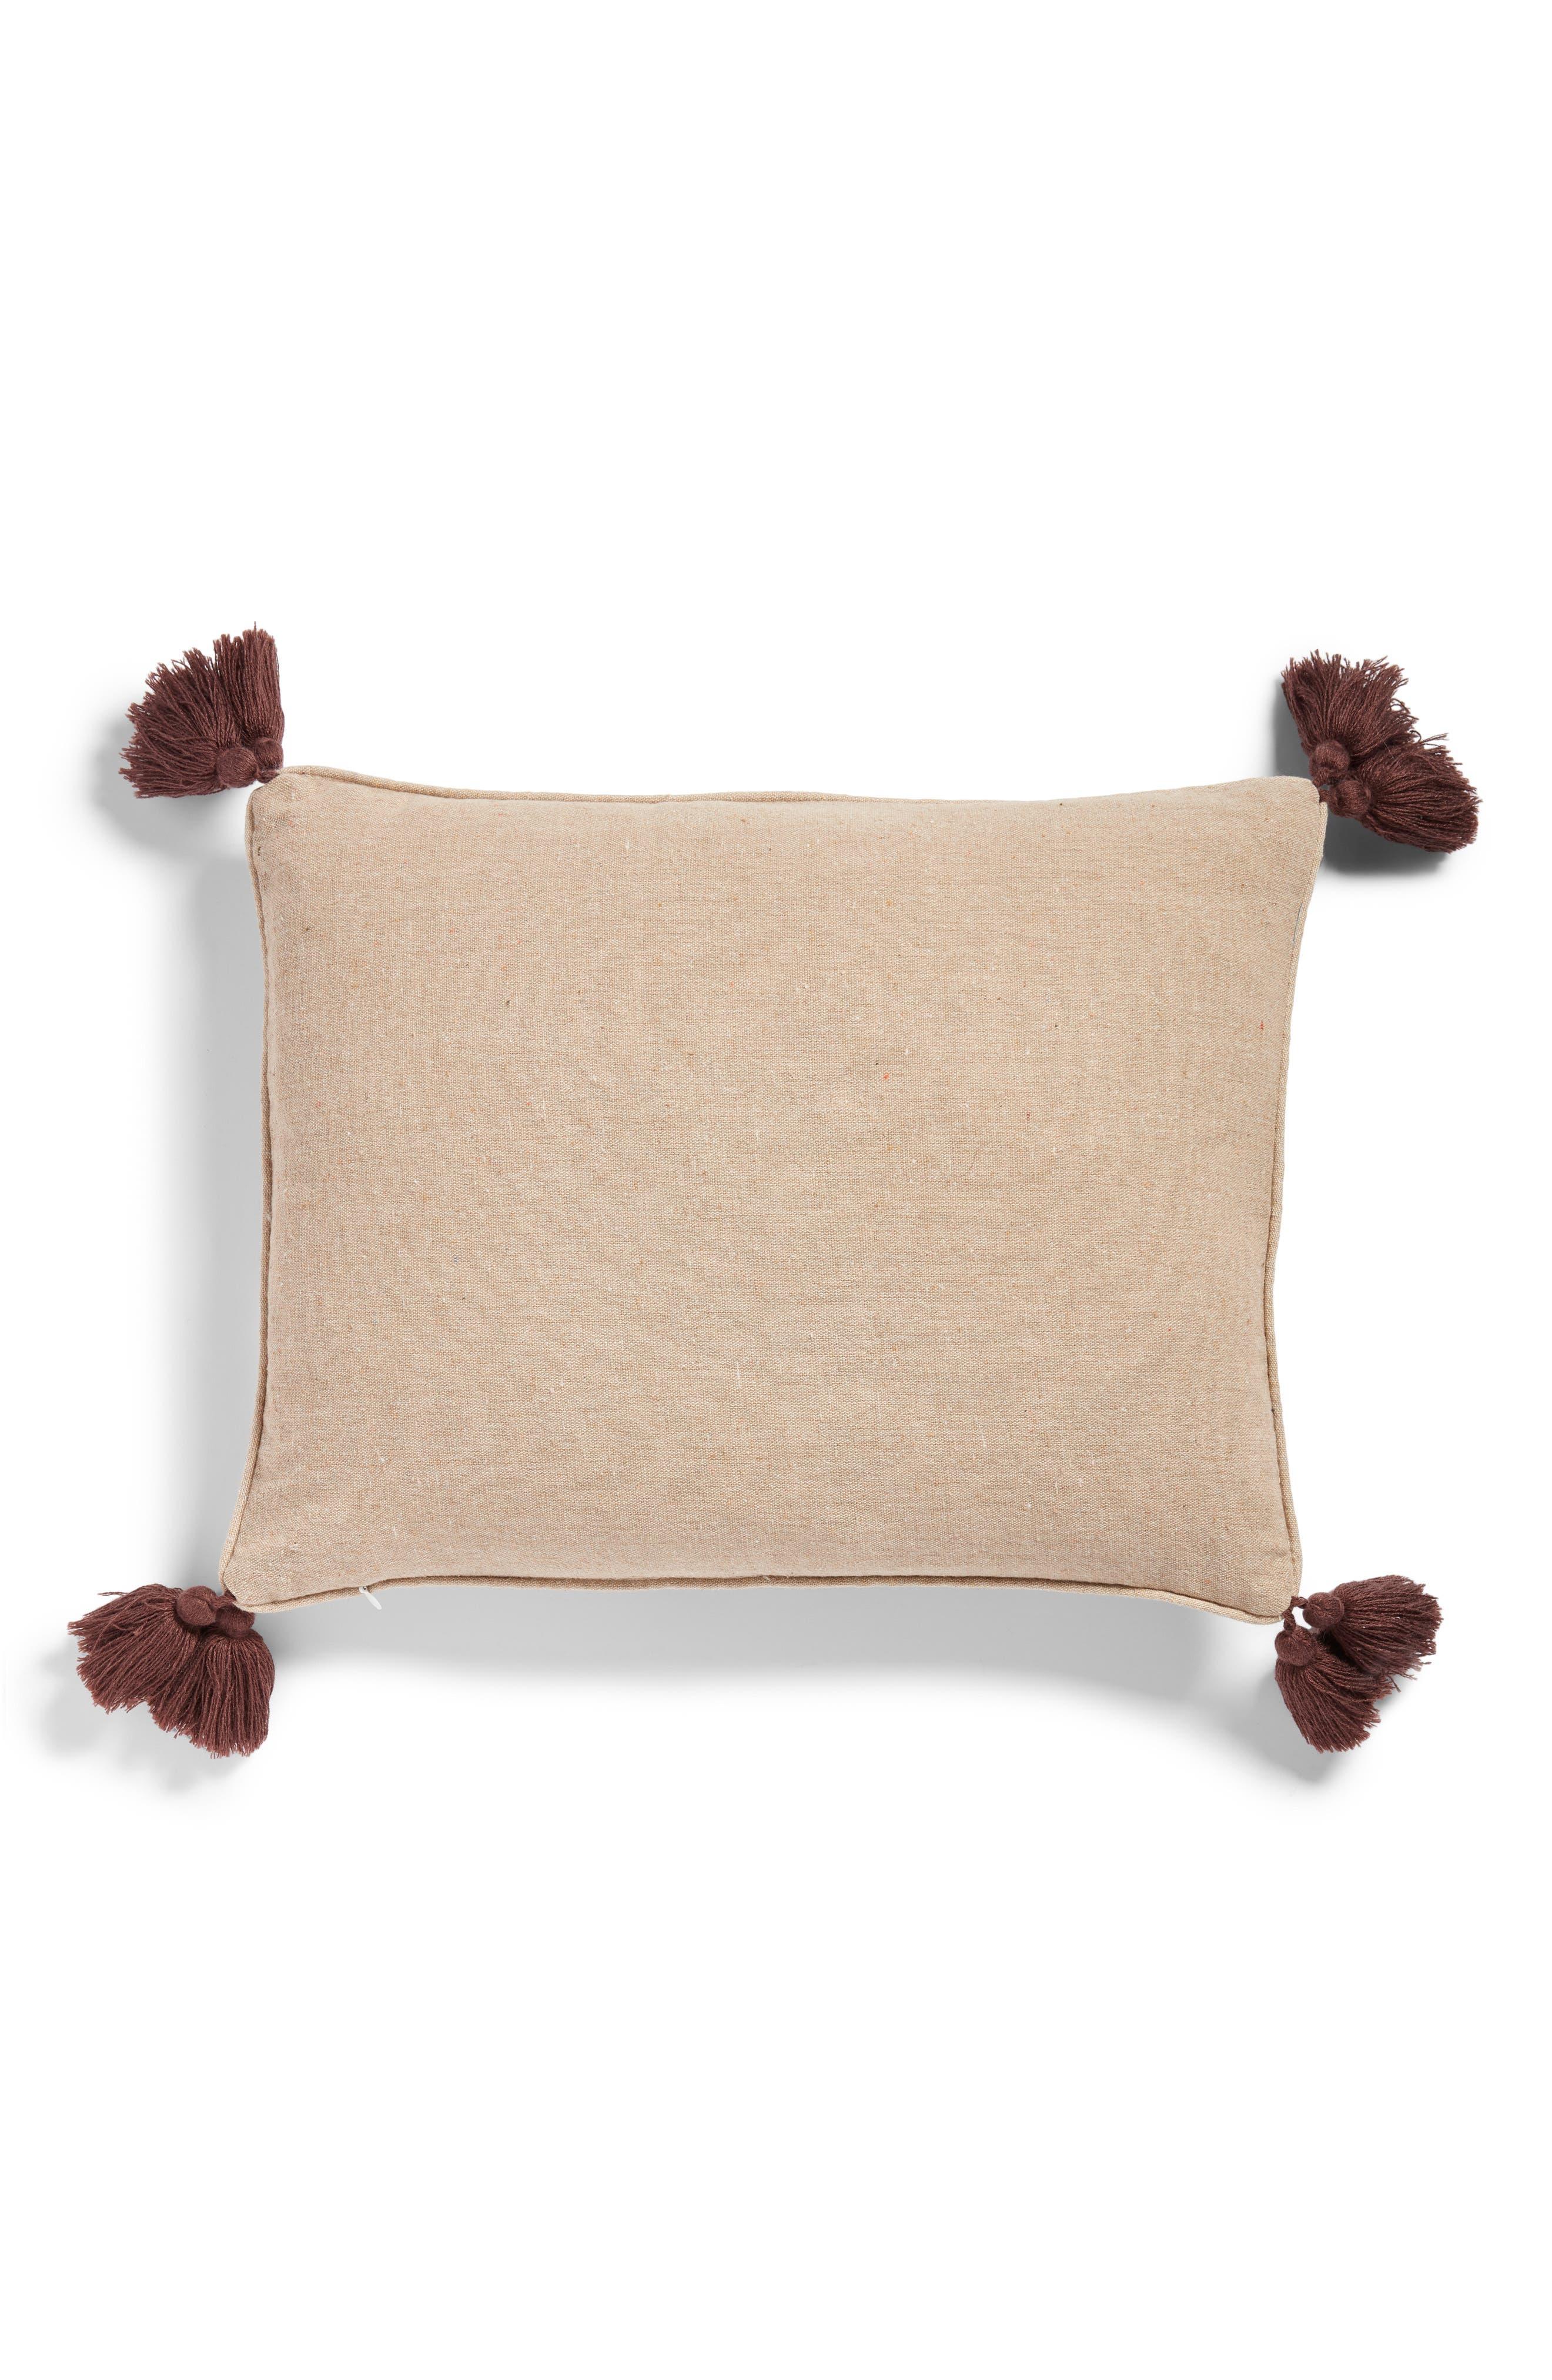 LEVTEX,                             Amata Medallion Tassel Accent Pillow,                             Alternate thumbnail 2, color,                             TAUPE